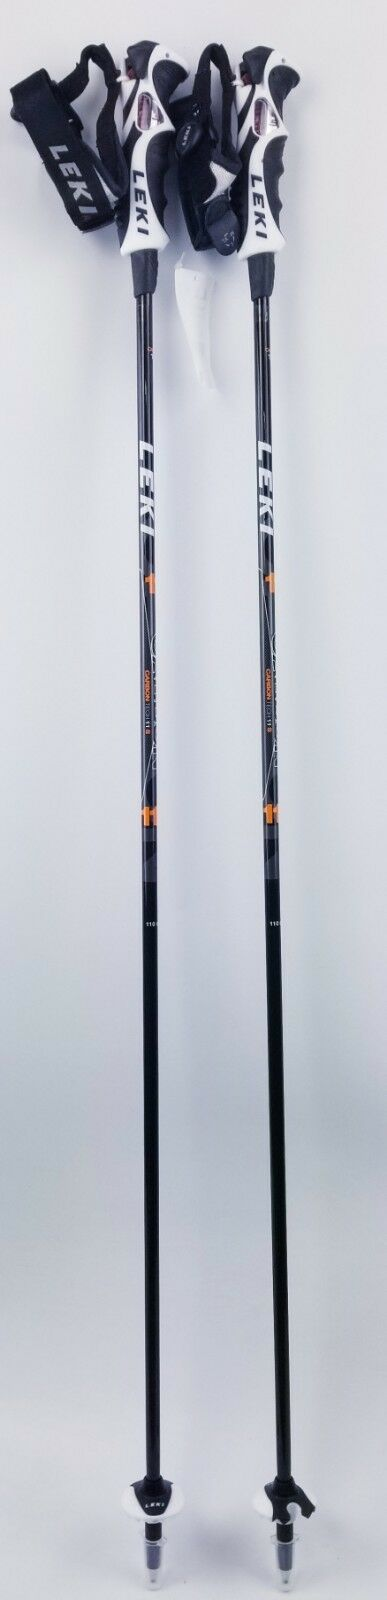 220 LEKI  Carbon 11S Trigger S Compatible Ski Poles 110CM 44  Downhill Skiing  lowest prices